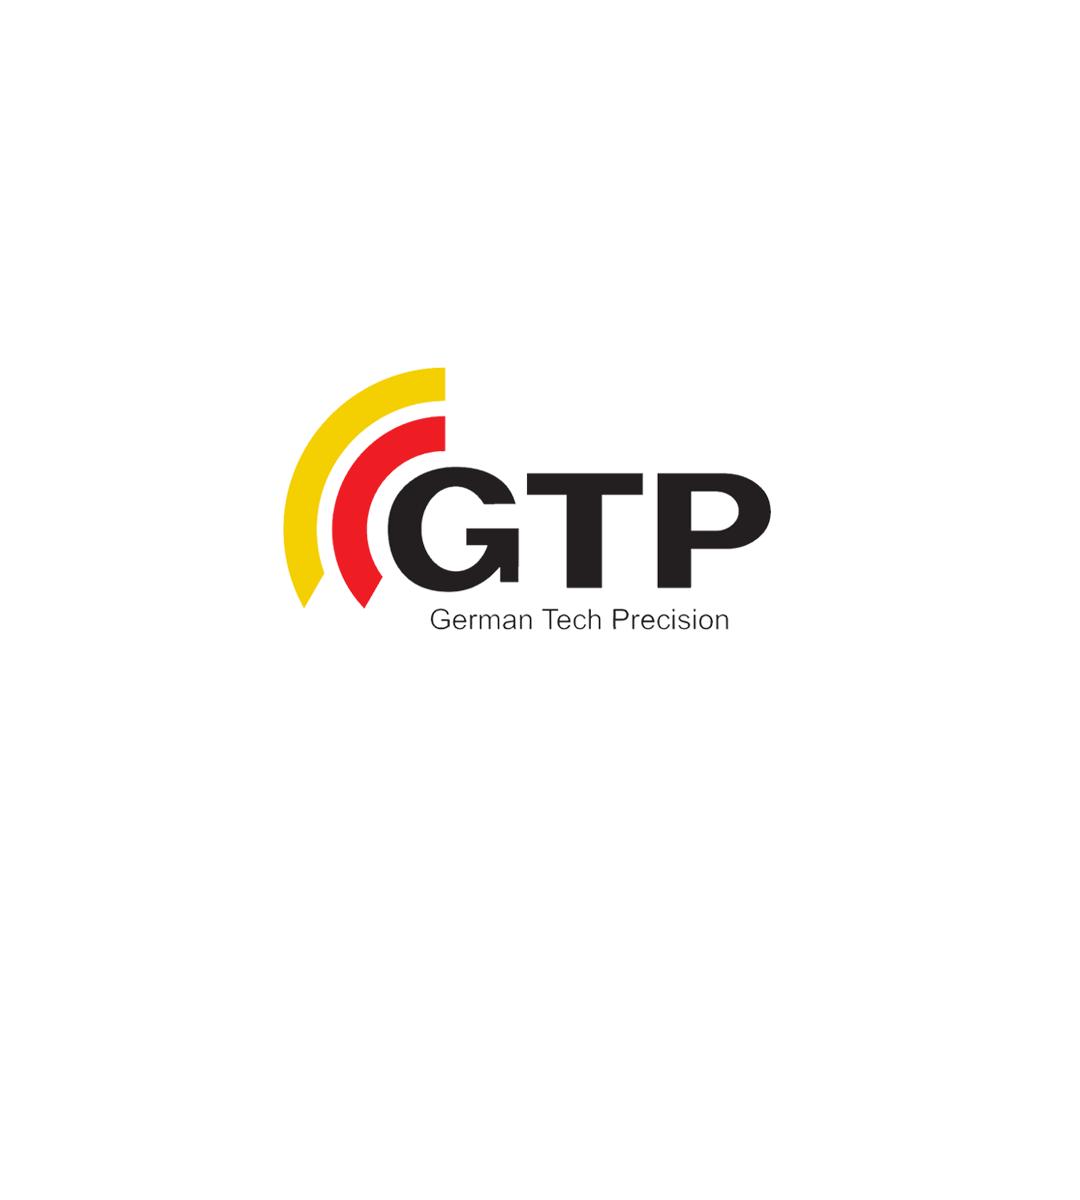 Двухскоростные планетарные редукторы GTP